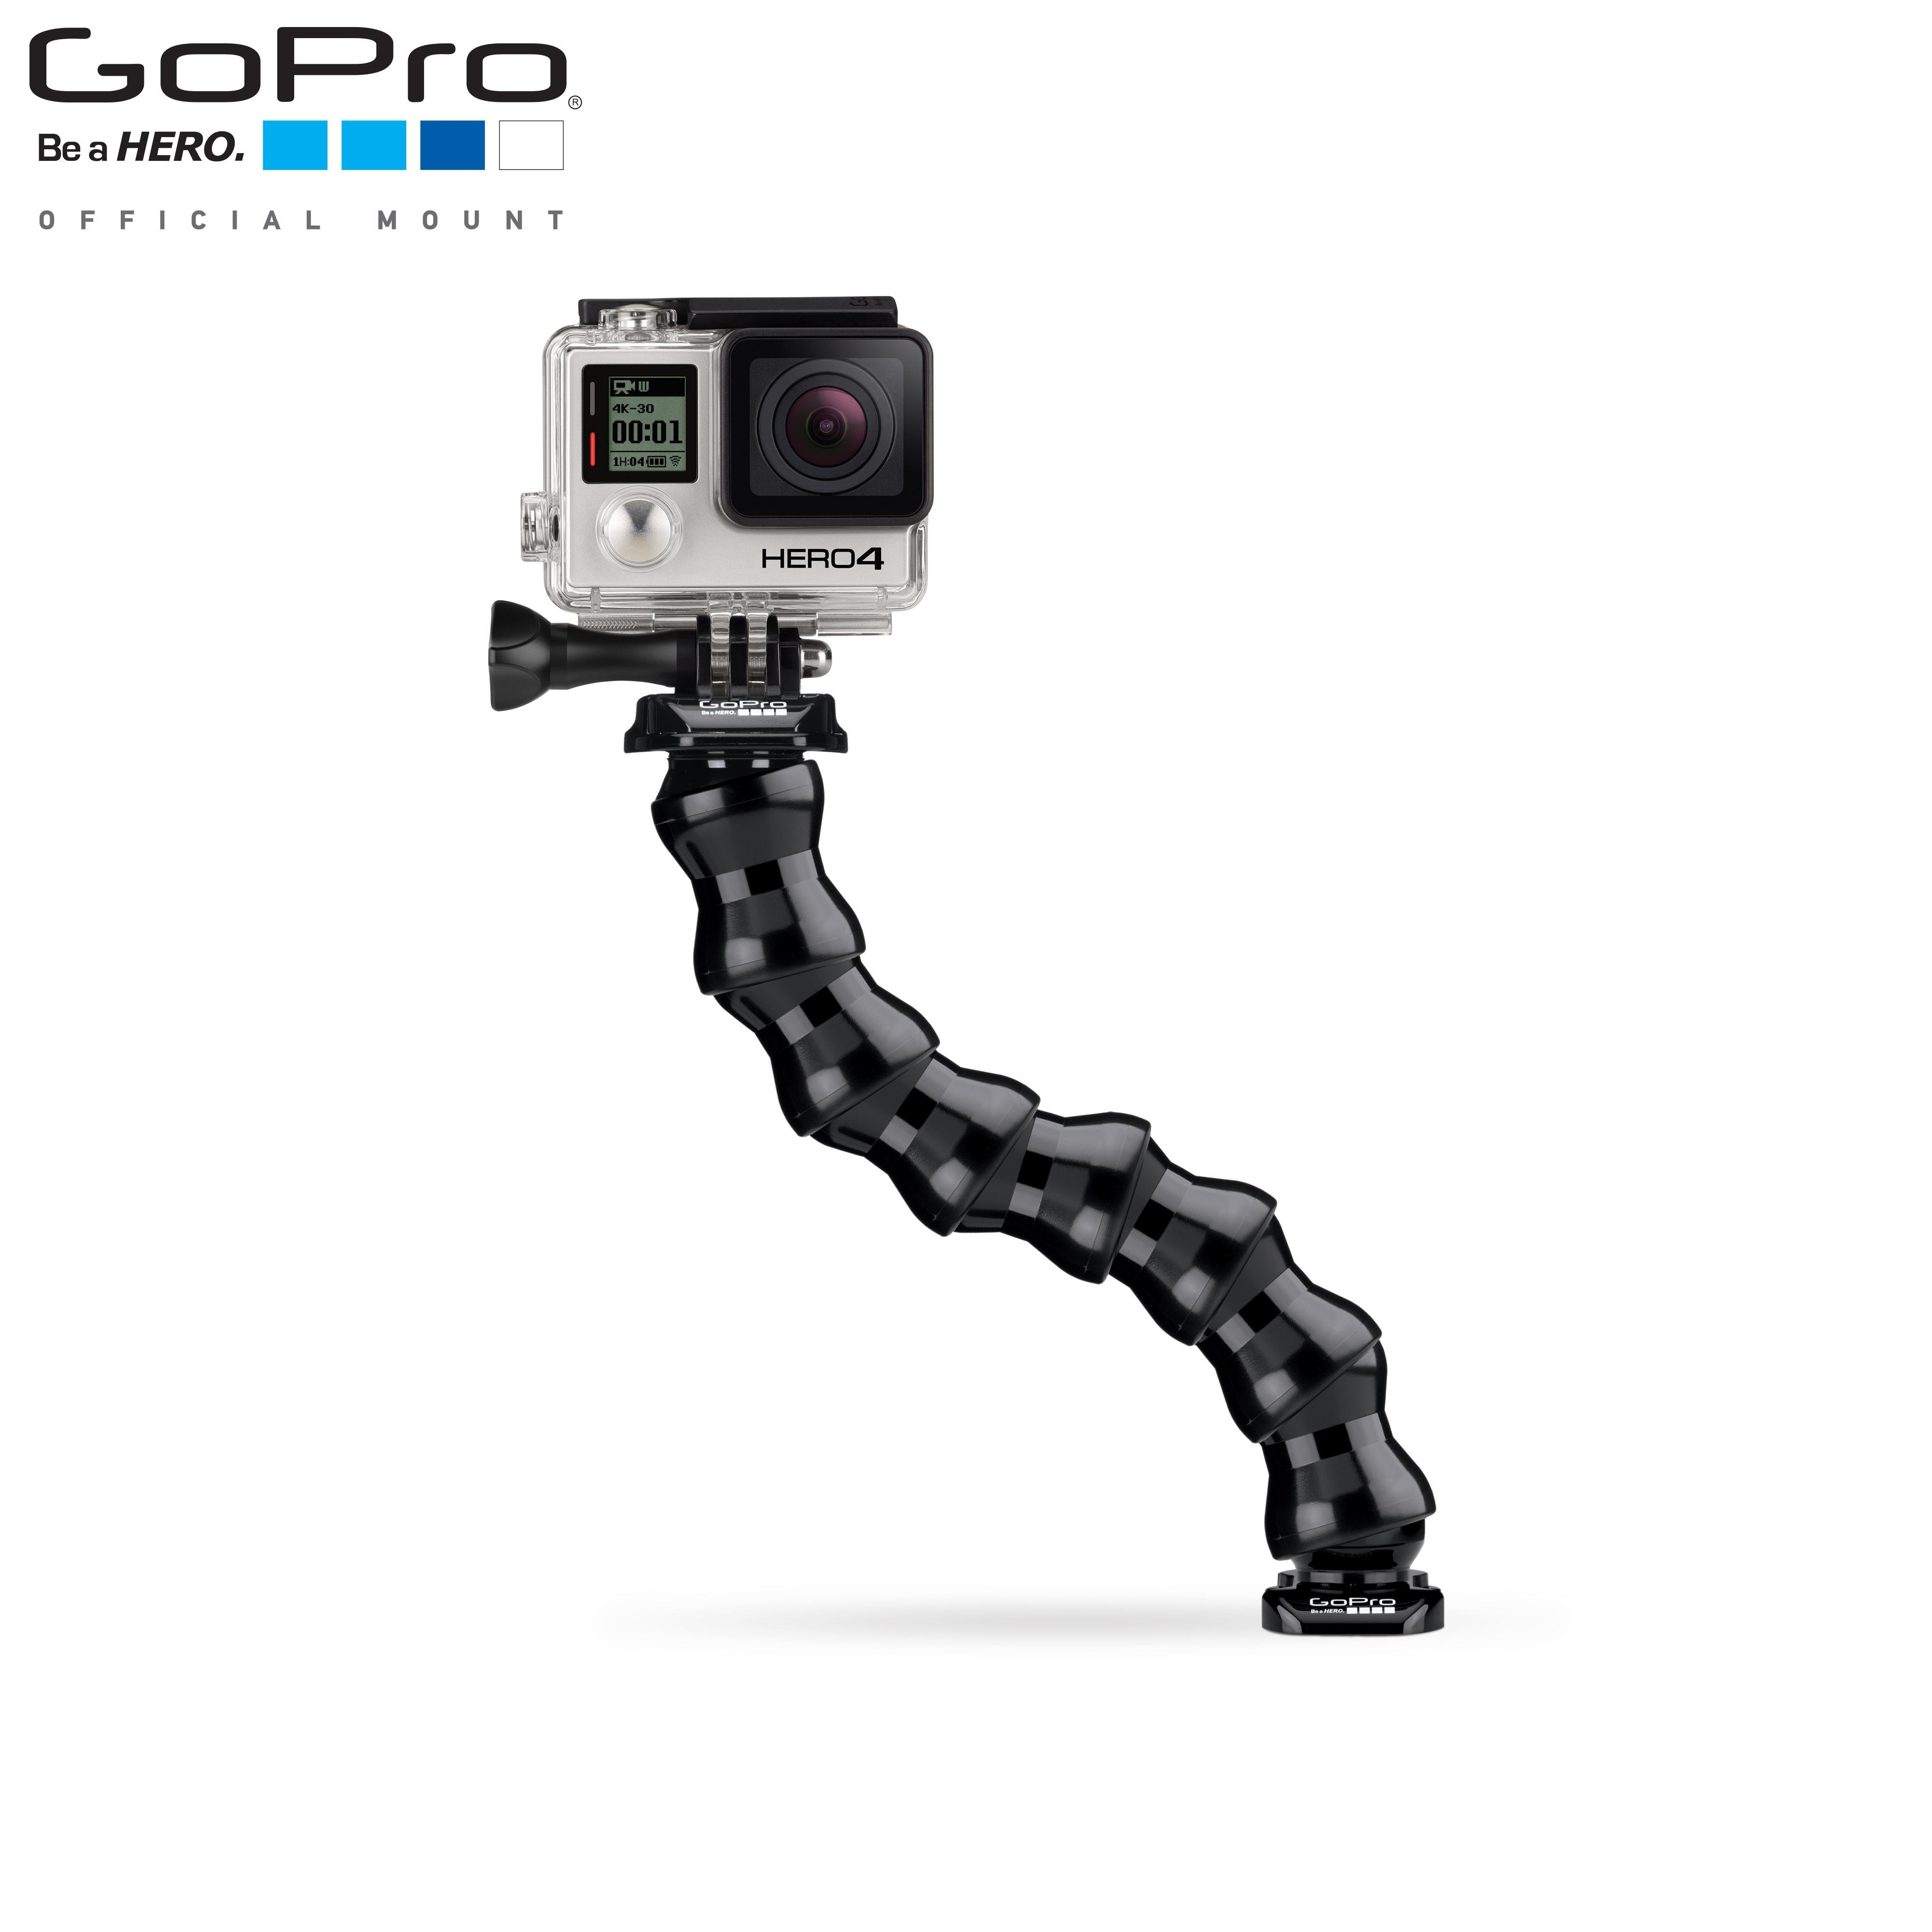 Amazon.com : GoPro Gooseneck : Camera & Photo